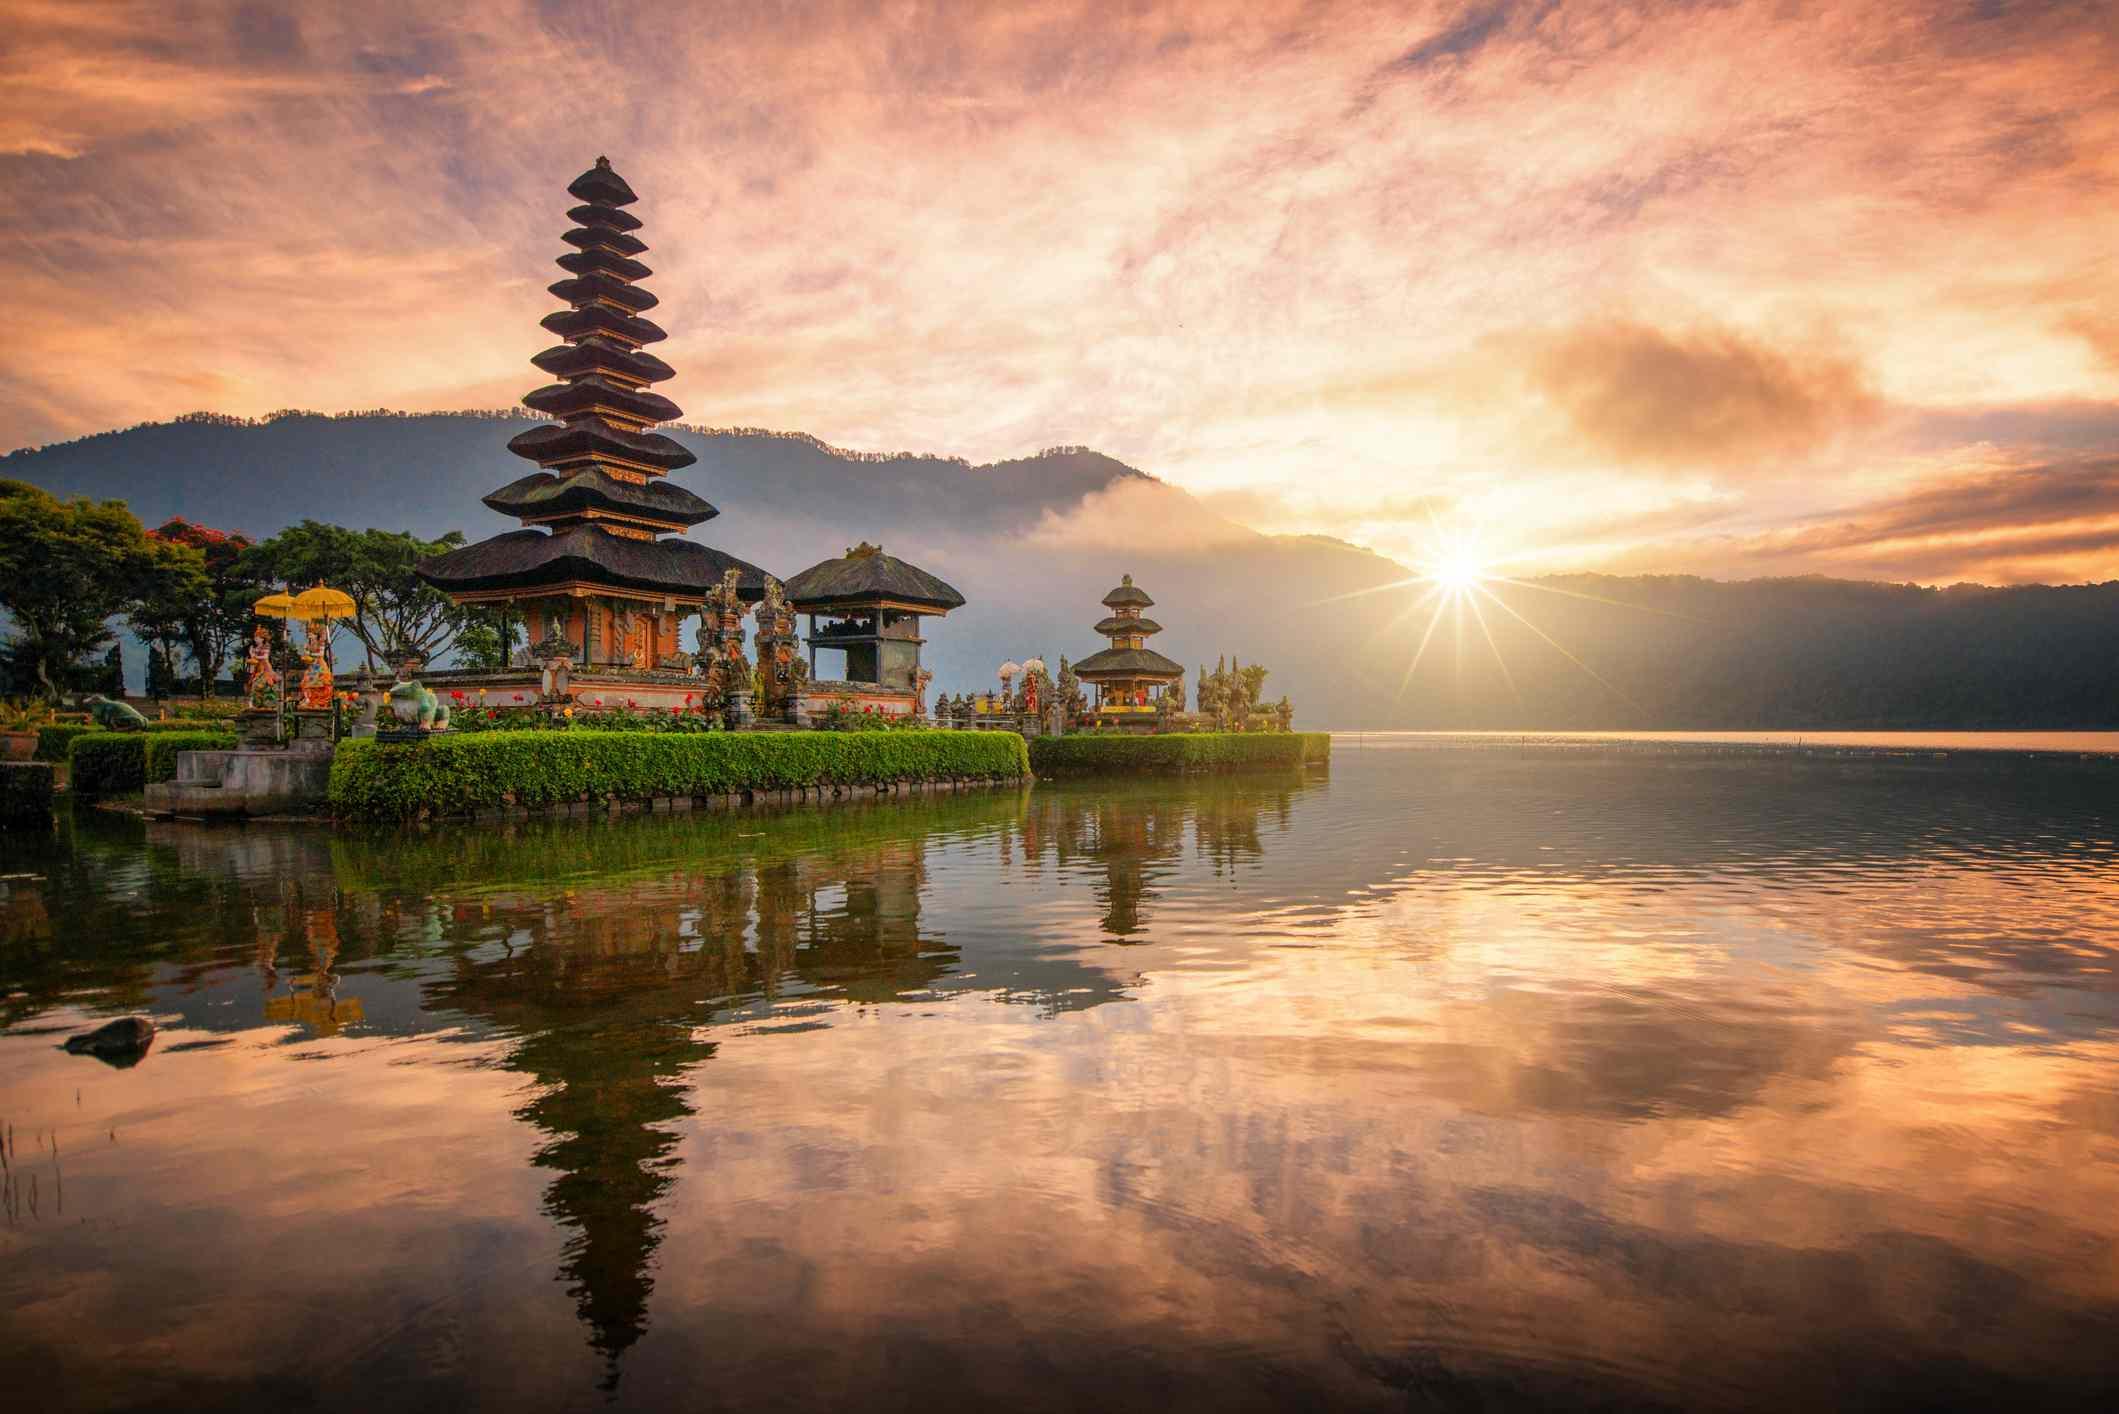 Pura Ulun Danu Bratan, Hindu temple in Bali